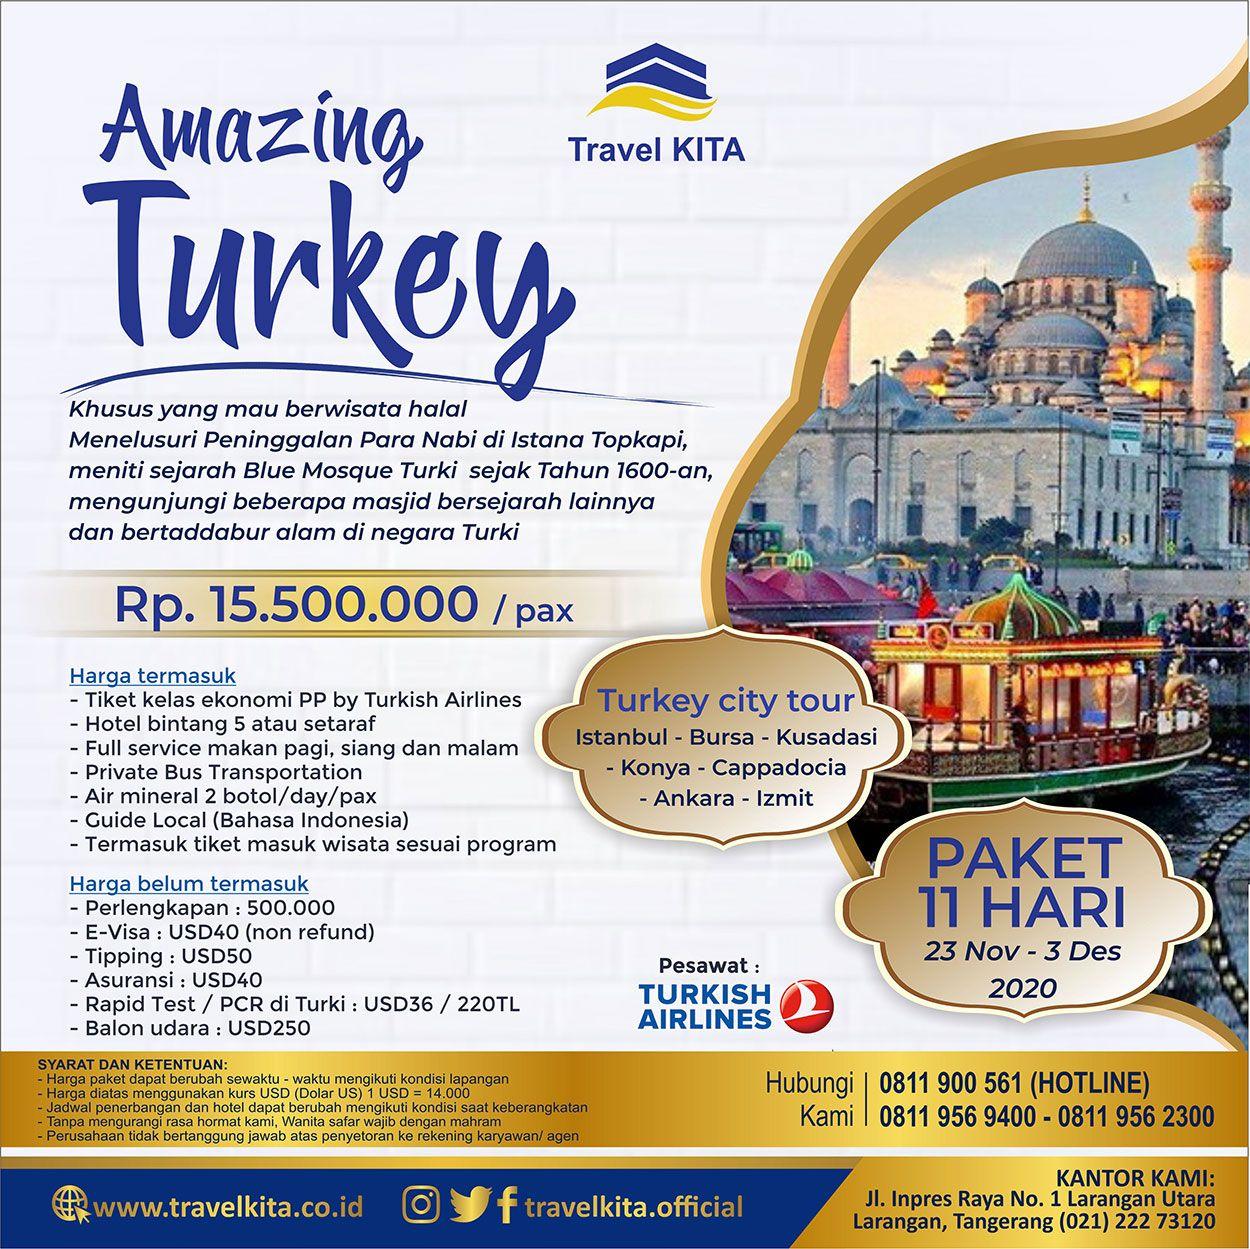 Amazing Turkey 2020